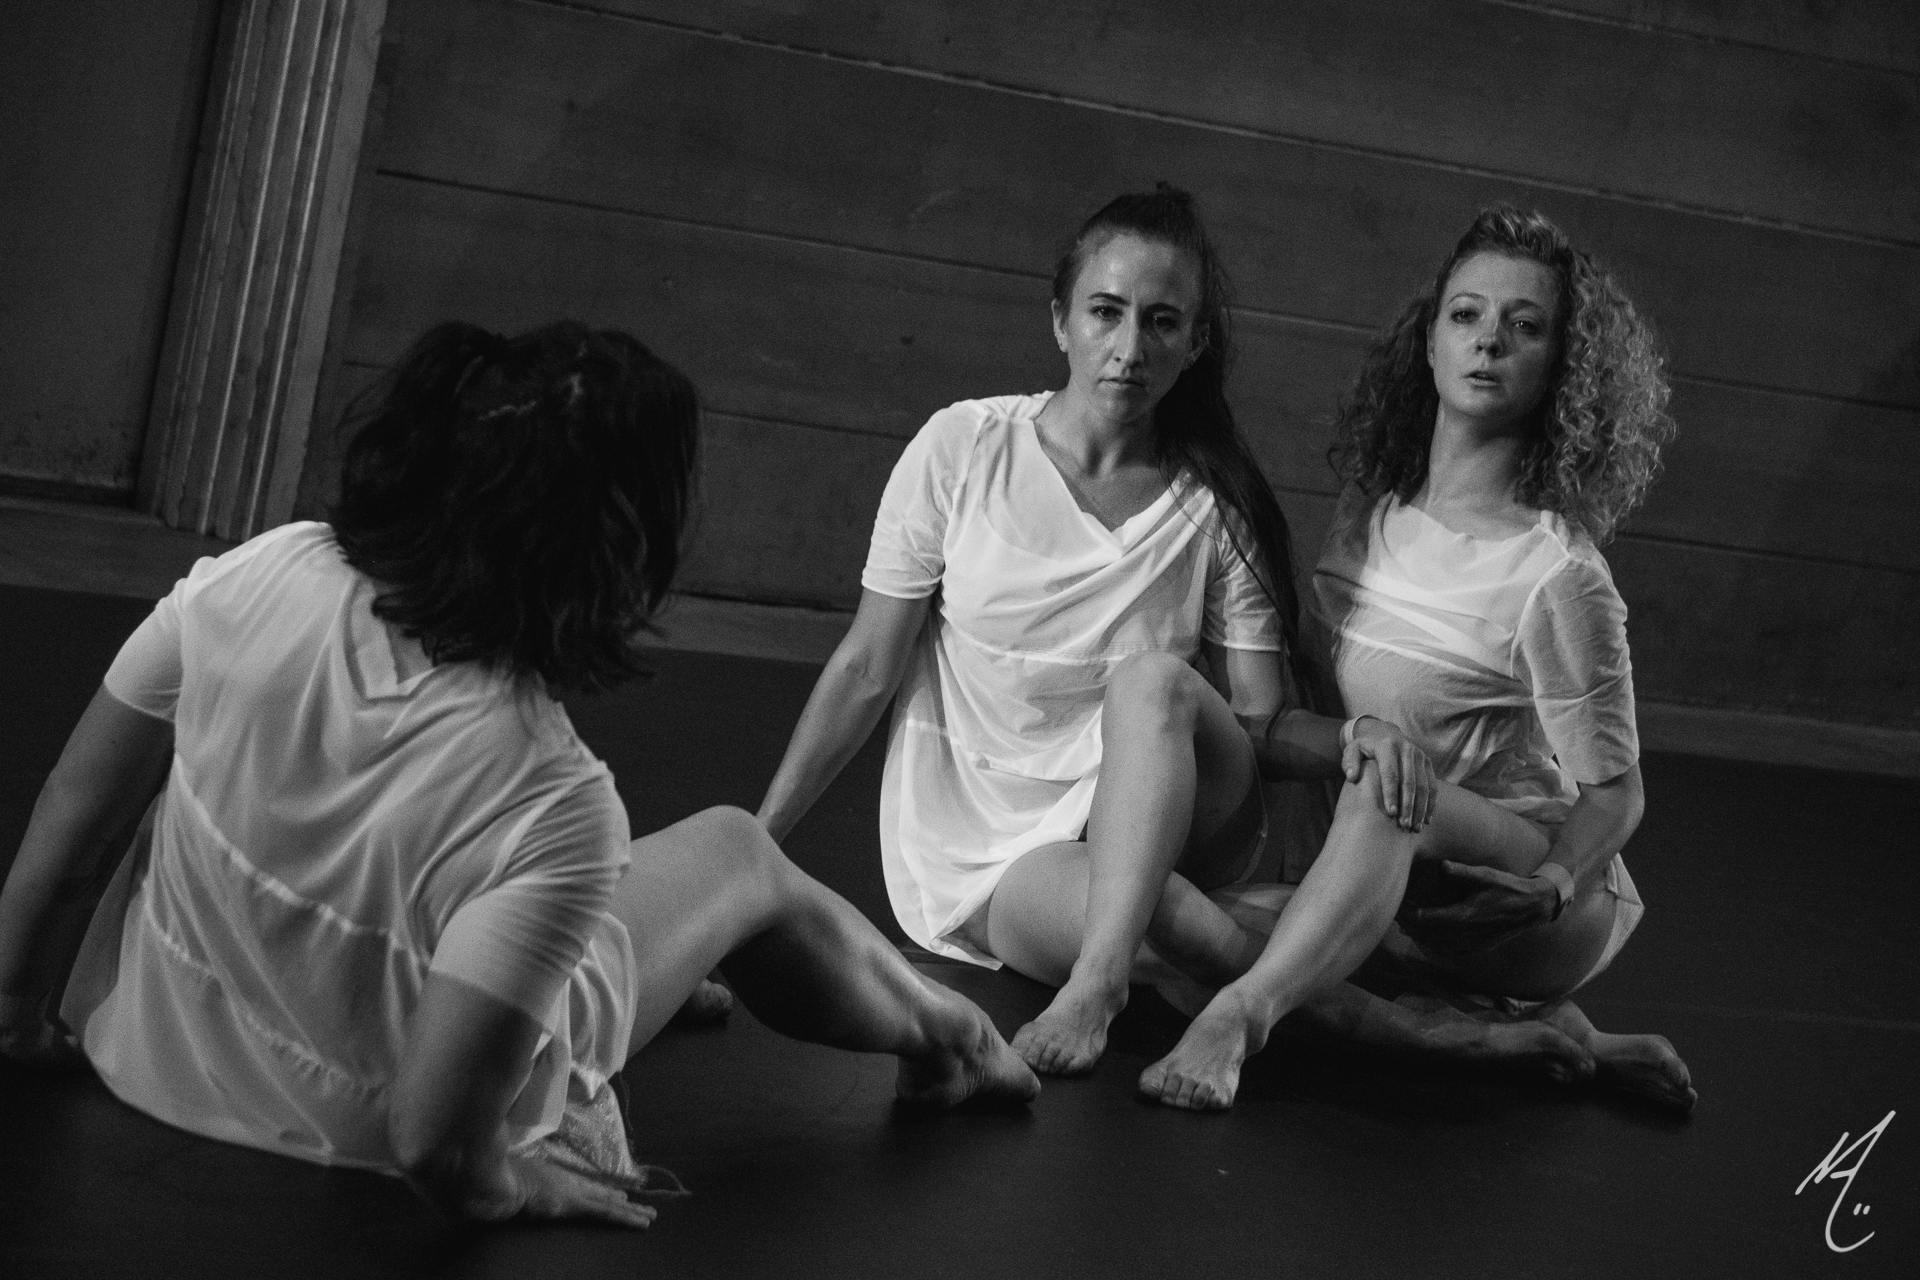 Dancers: Maggie Bailey, Katie Hopkins, Hailley Laurèn